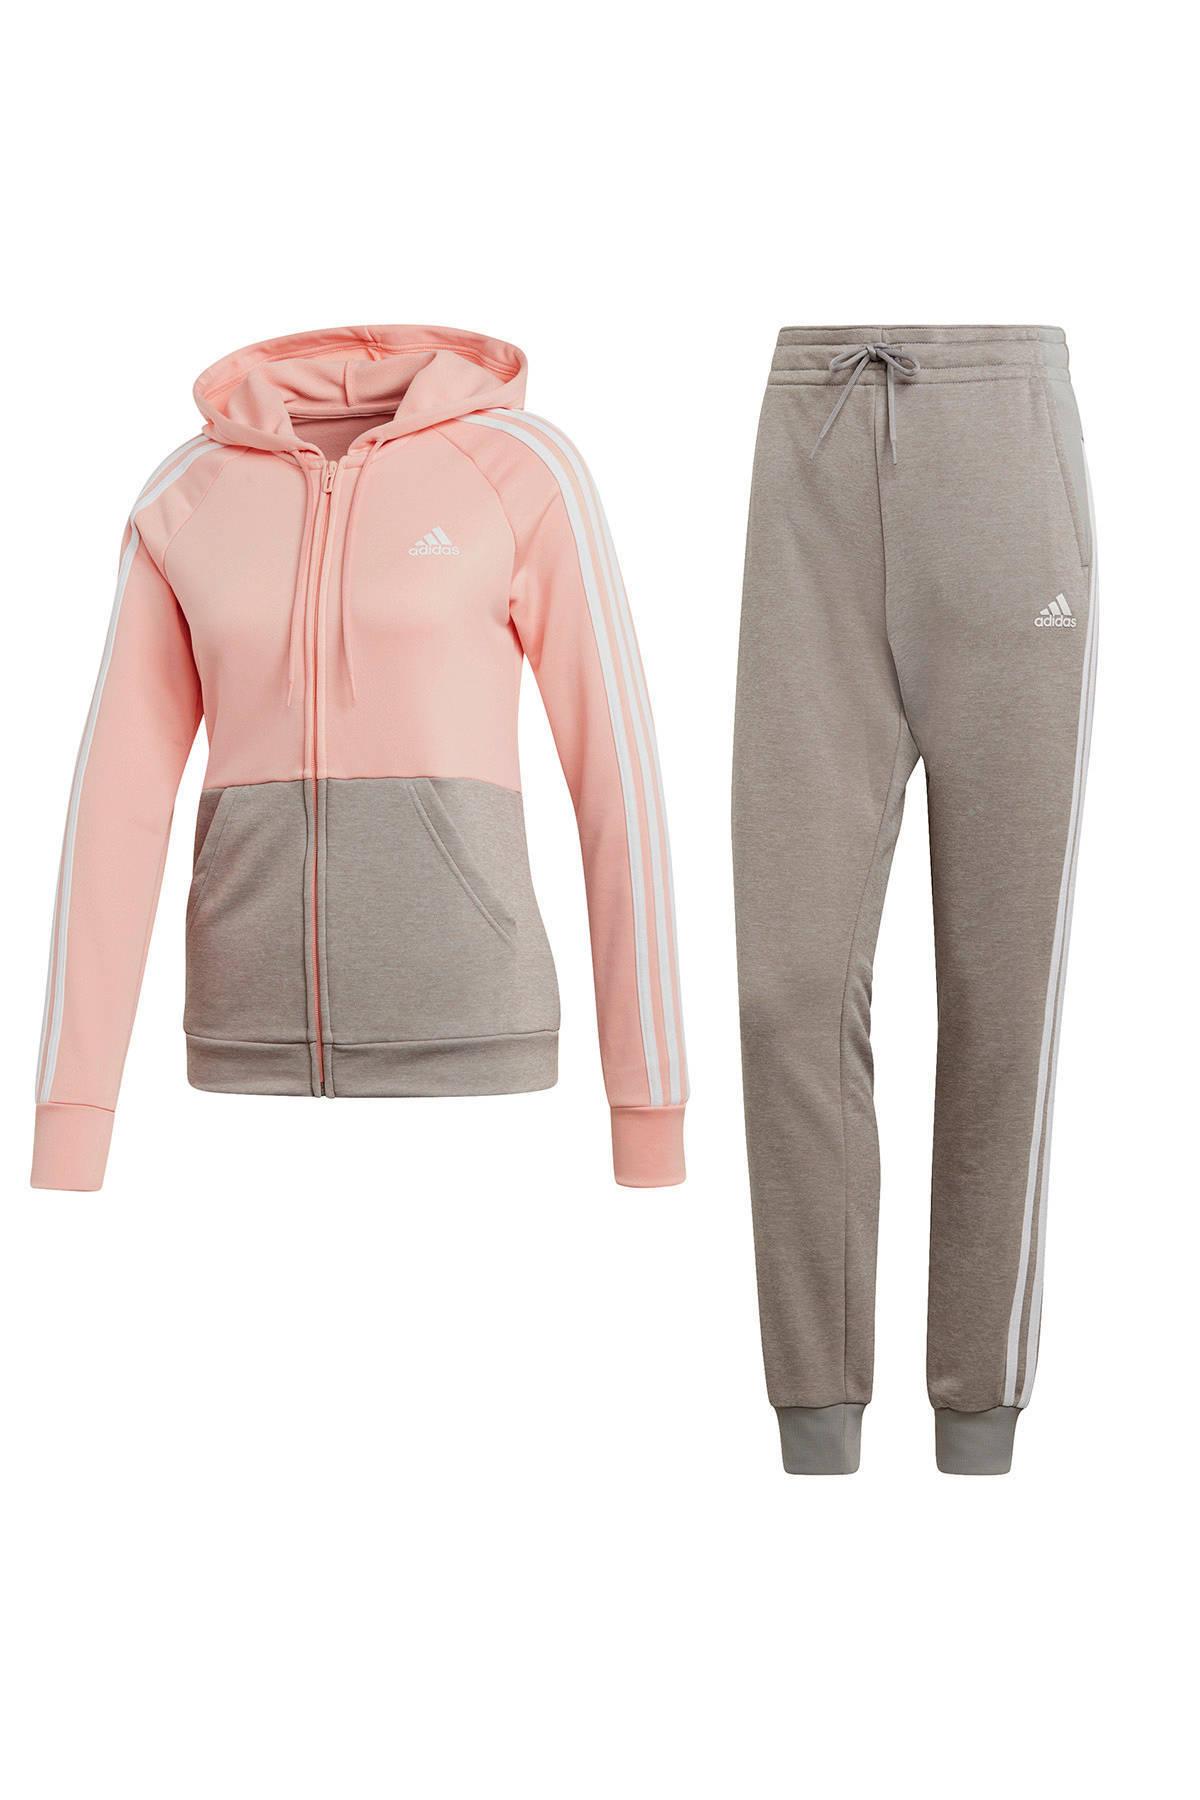 adidas Performance trainingspak roze/grijs | wehkamp